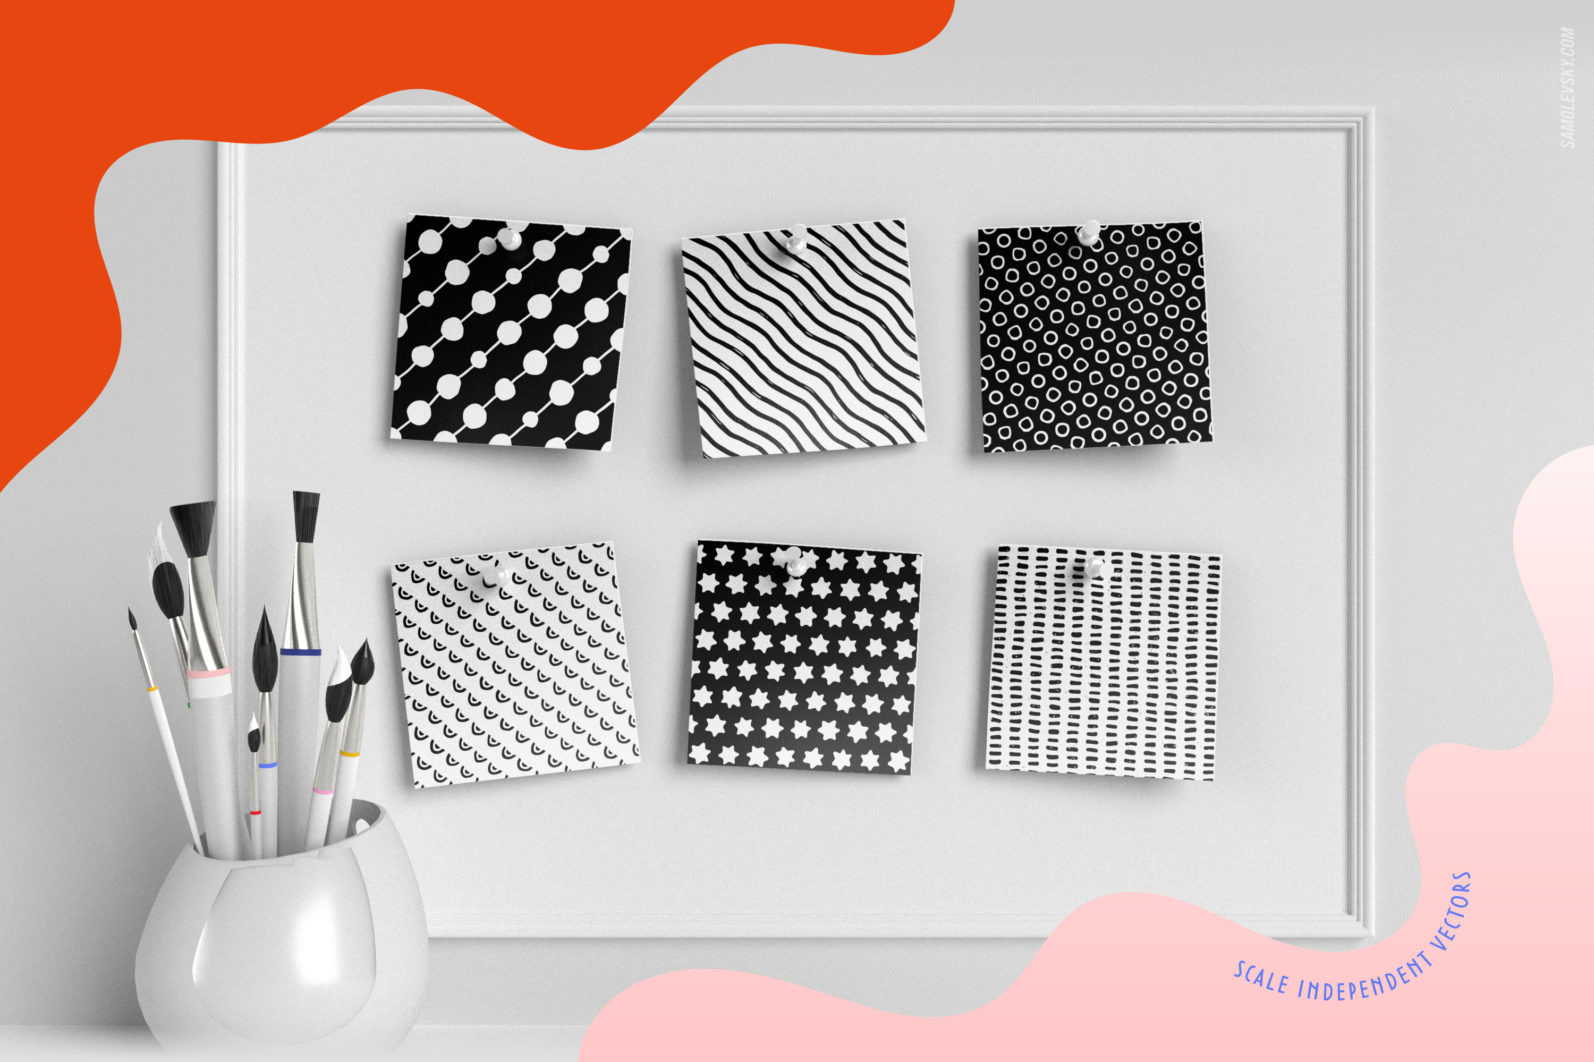 Handmade patterns bundle - 300 seamless patterns, brushes, and shapes - Samolevsky.com Handmade patterns bundle 18 scaled -